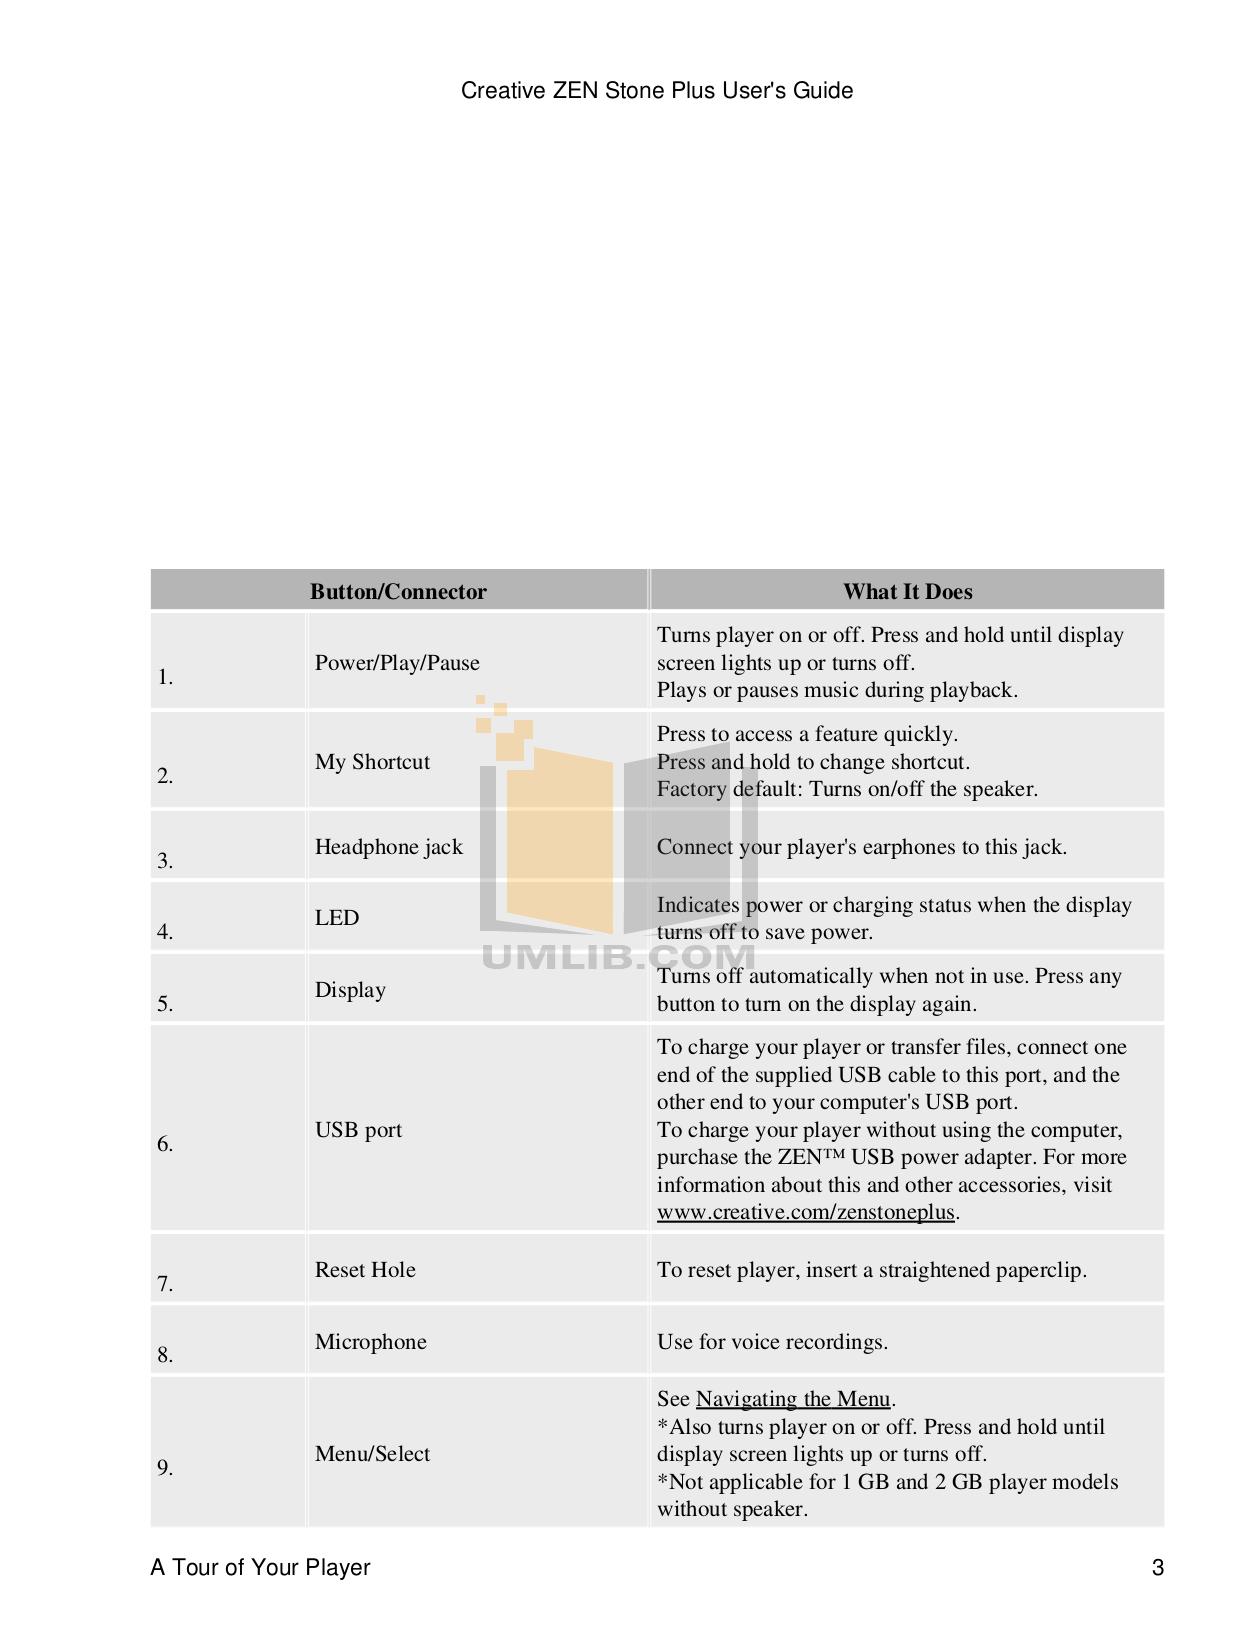 pdf manual for creative mp3 player zen zen stone plus 4gb rh umlib com creative zen stone plus user manual zen stone plus user guide